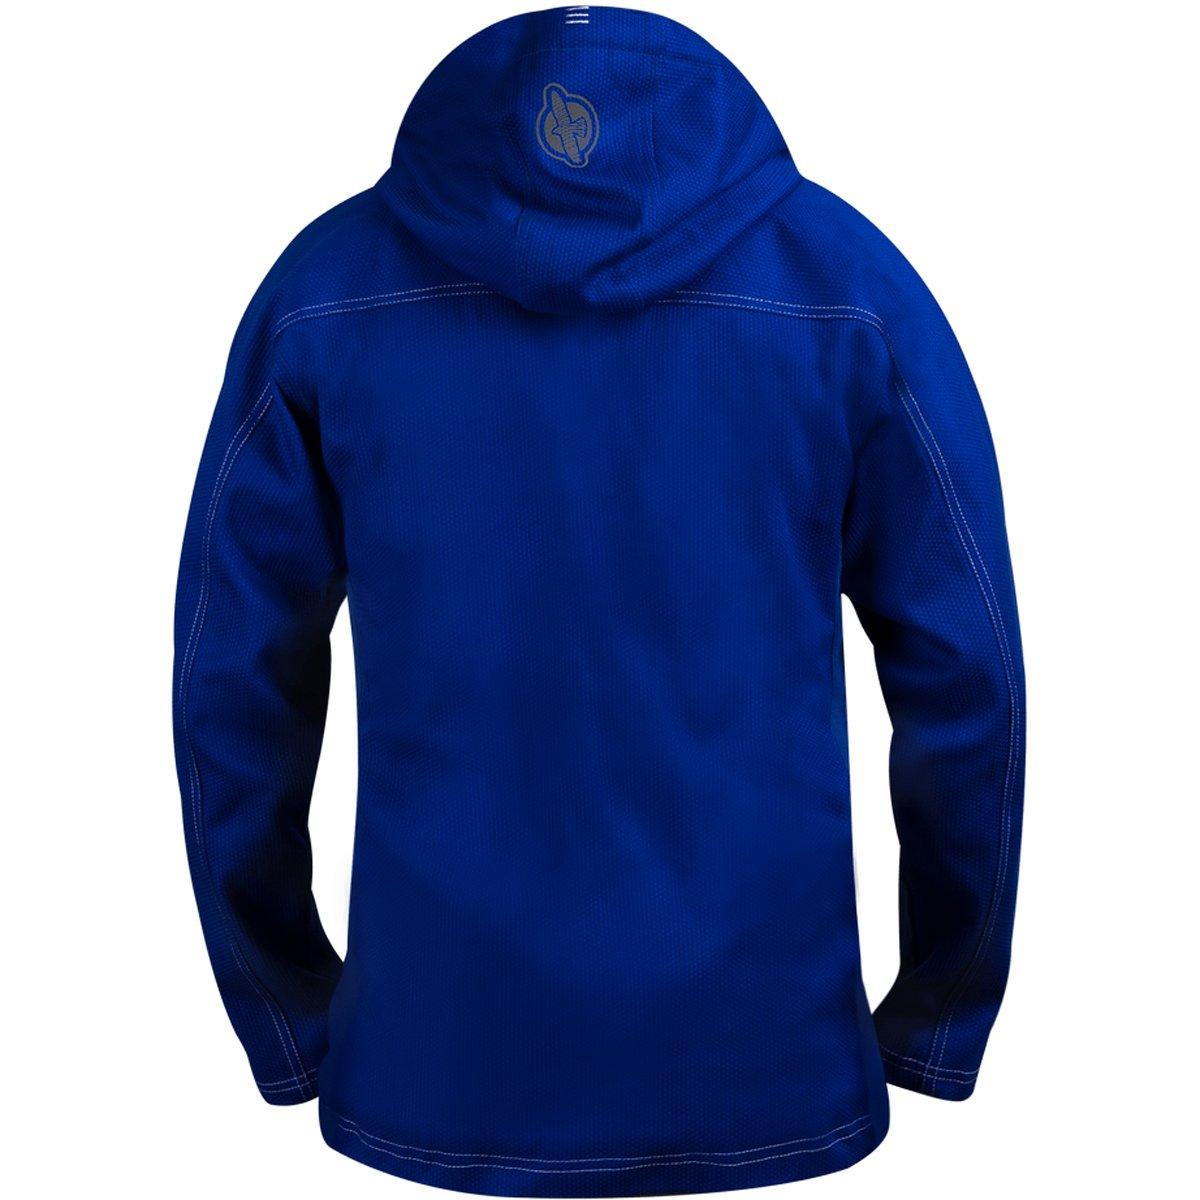 Hayabusa Cotton Uwagi Pro GI Jacket 2.0